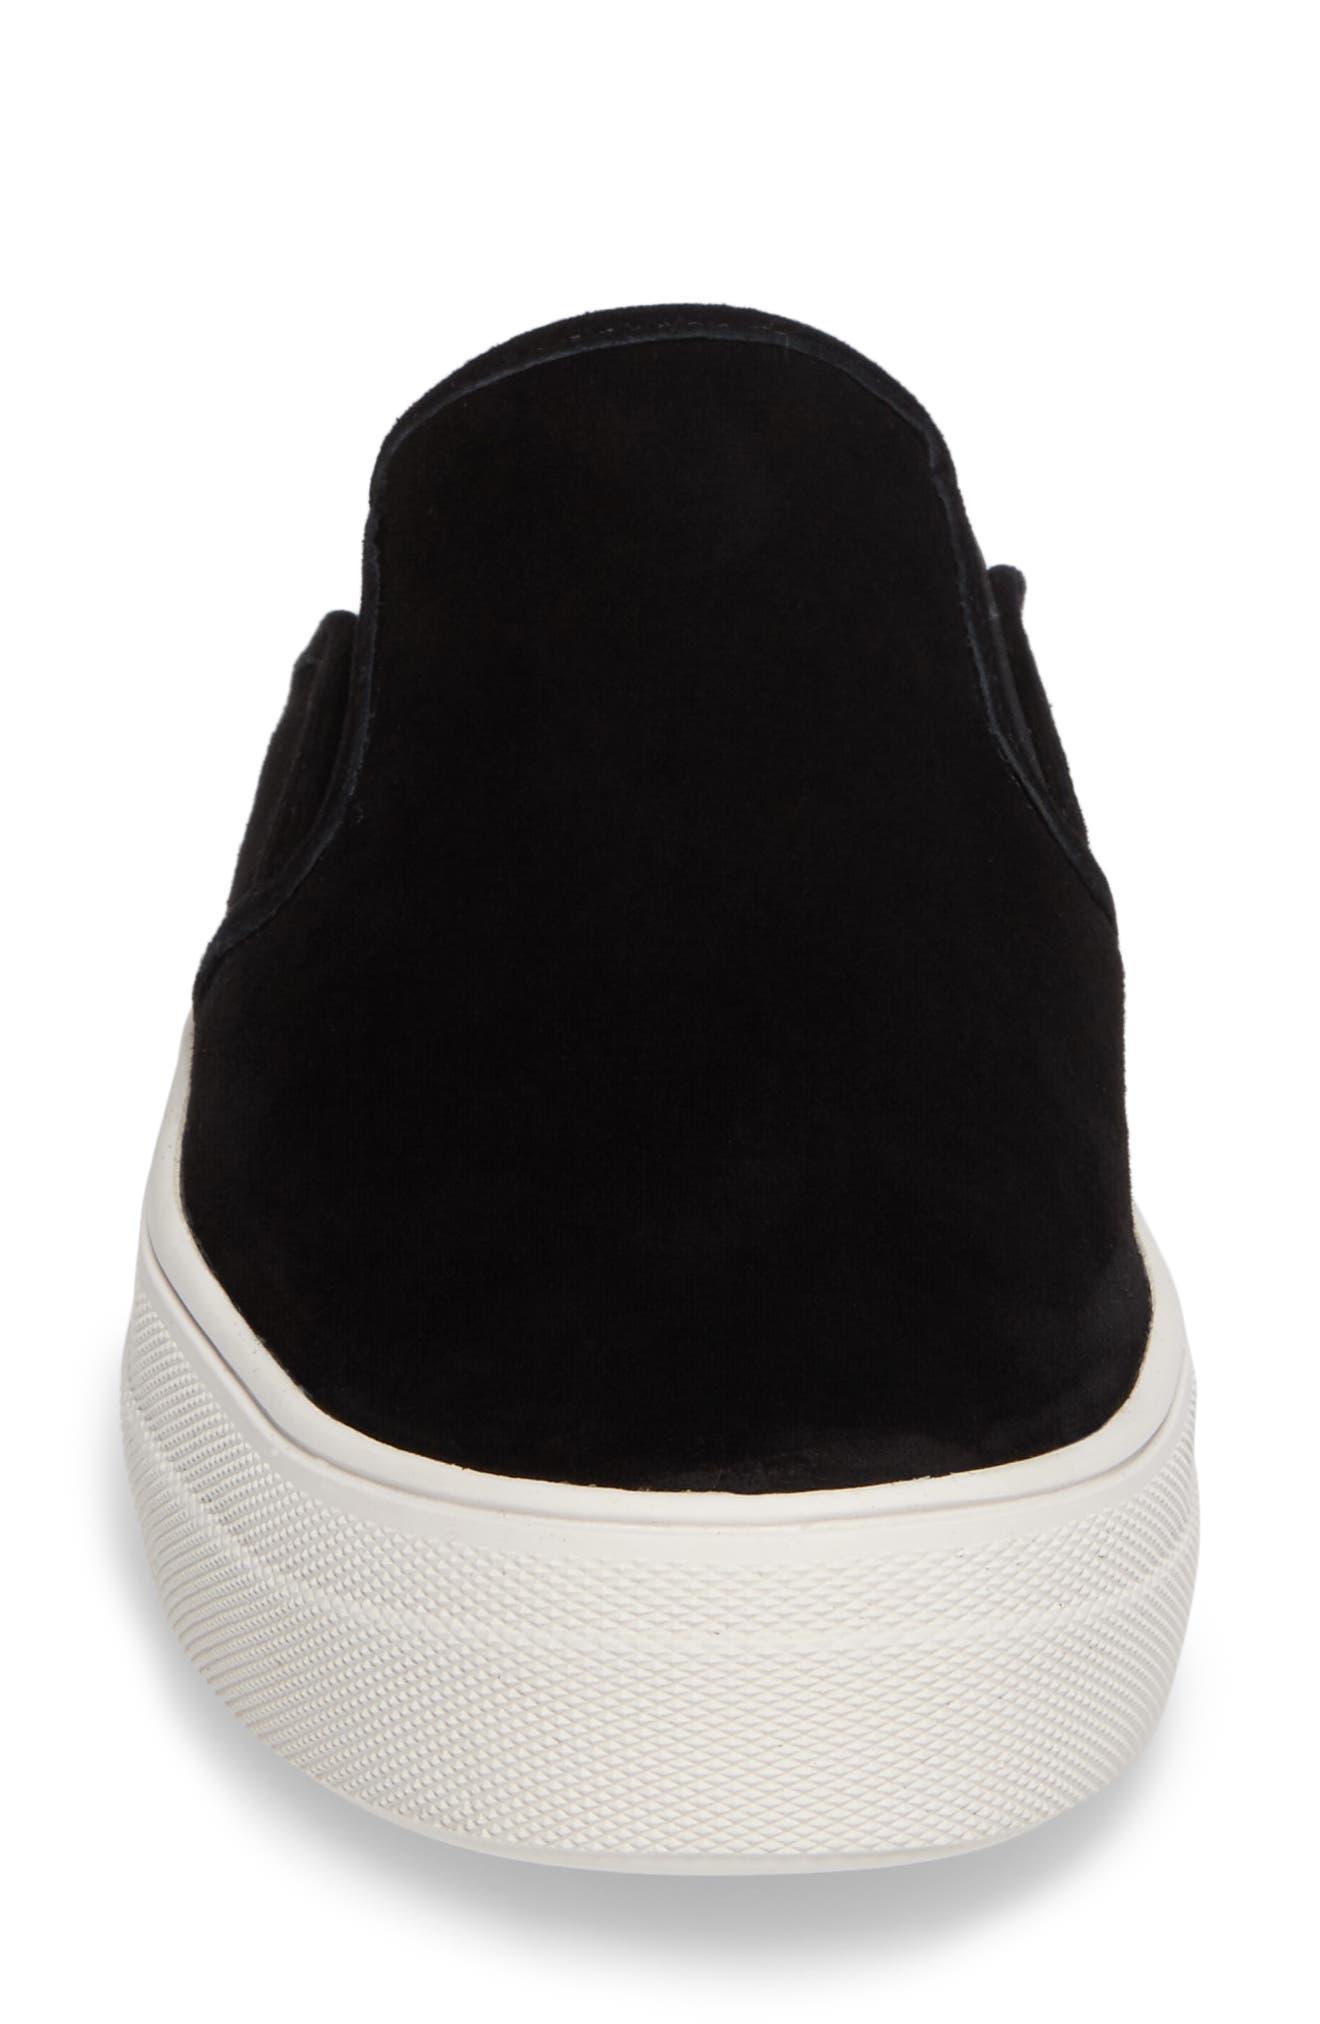 Glenda Sneaker Mule,                             Alternate thumbnail 4, color,                             006